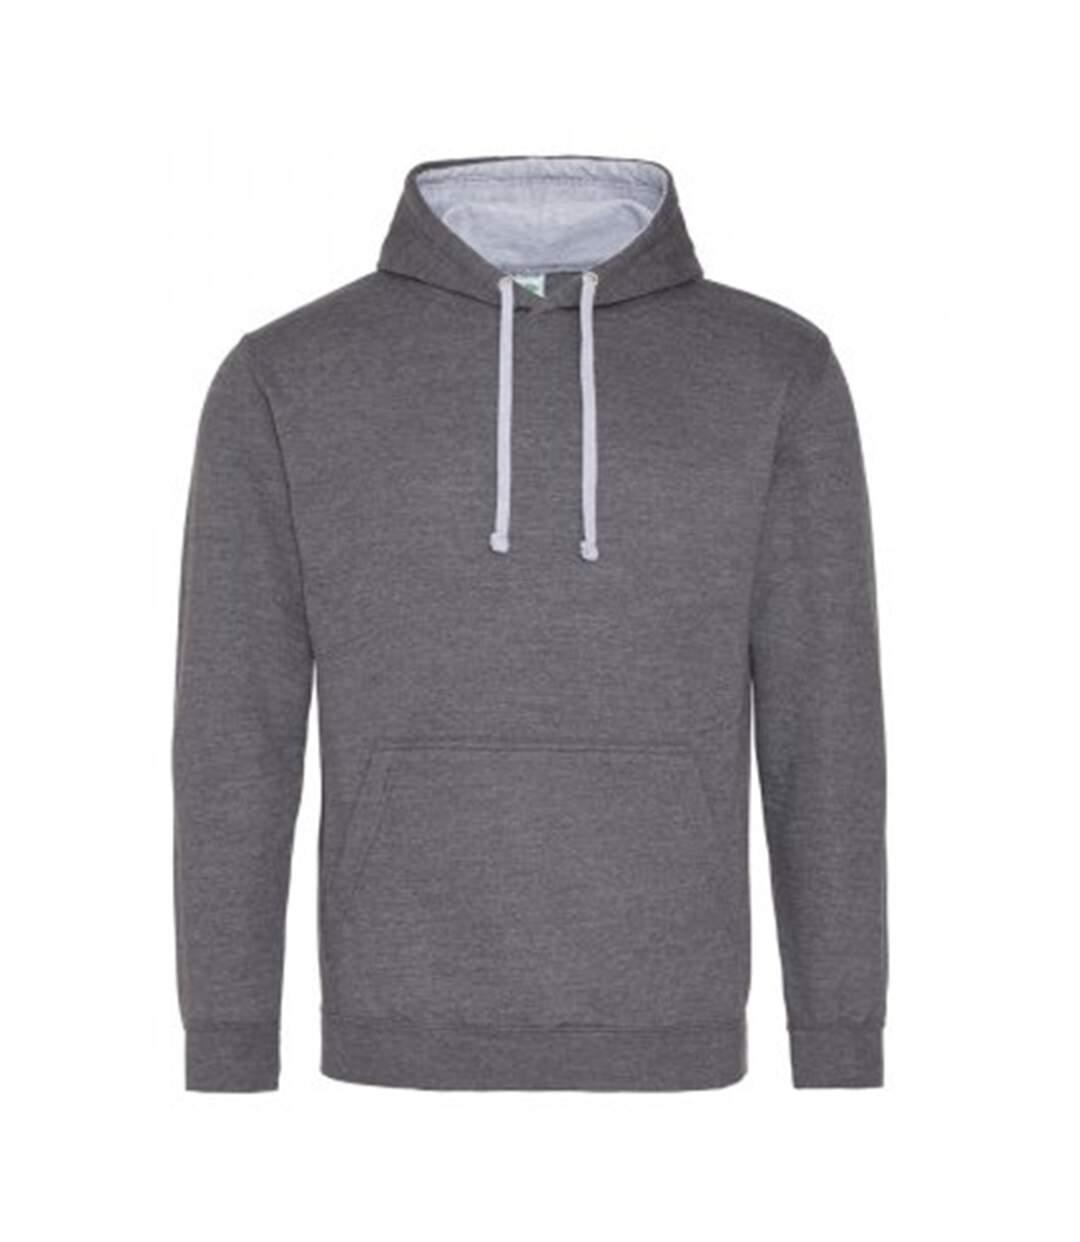 Awdis Varsity Hooded Sweatshirt / Hoodie (Jet Black / Gold) - UTRW165